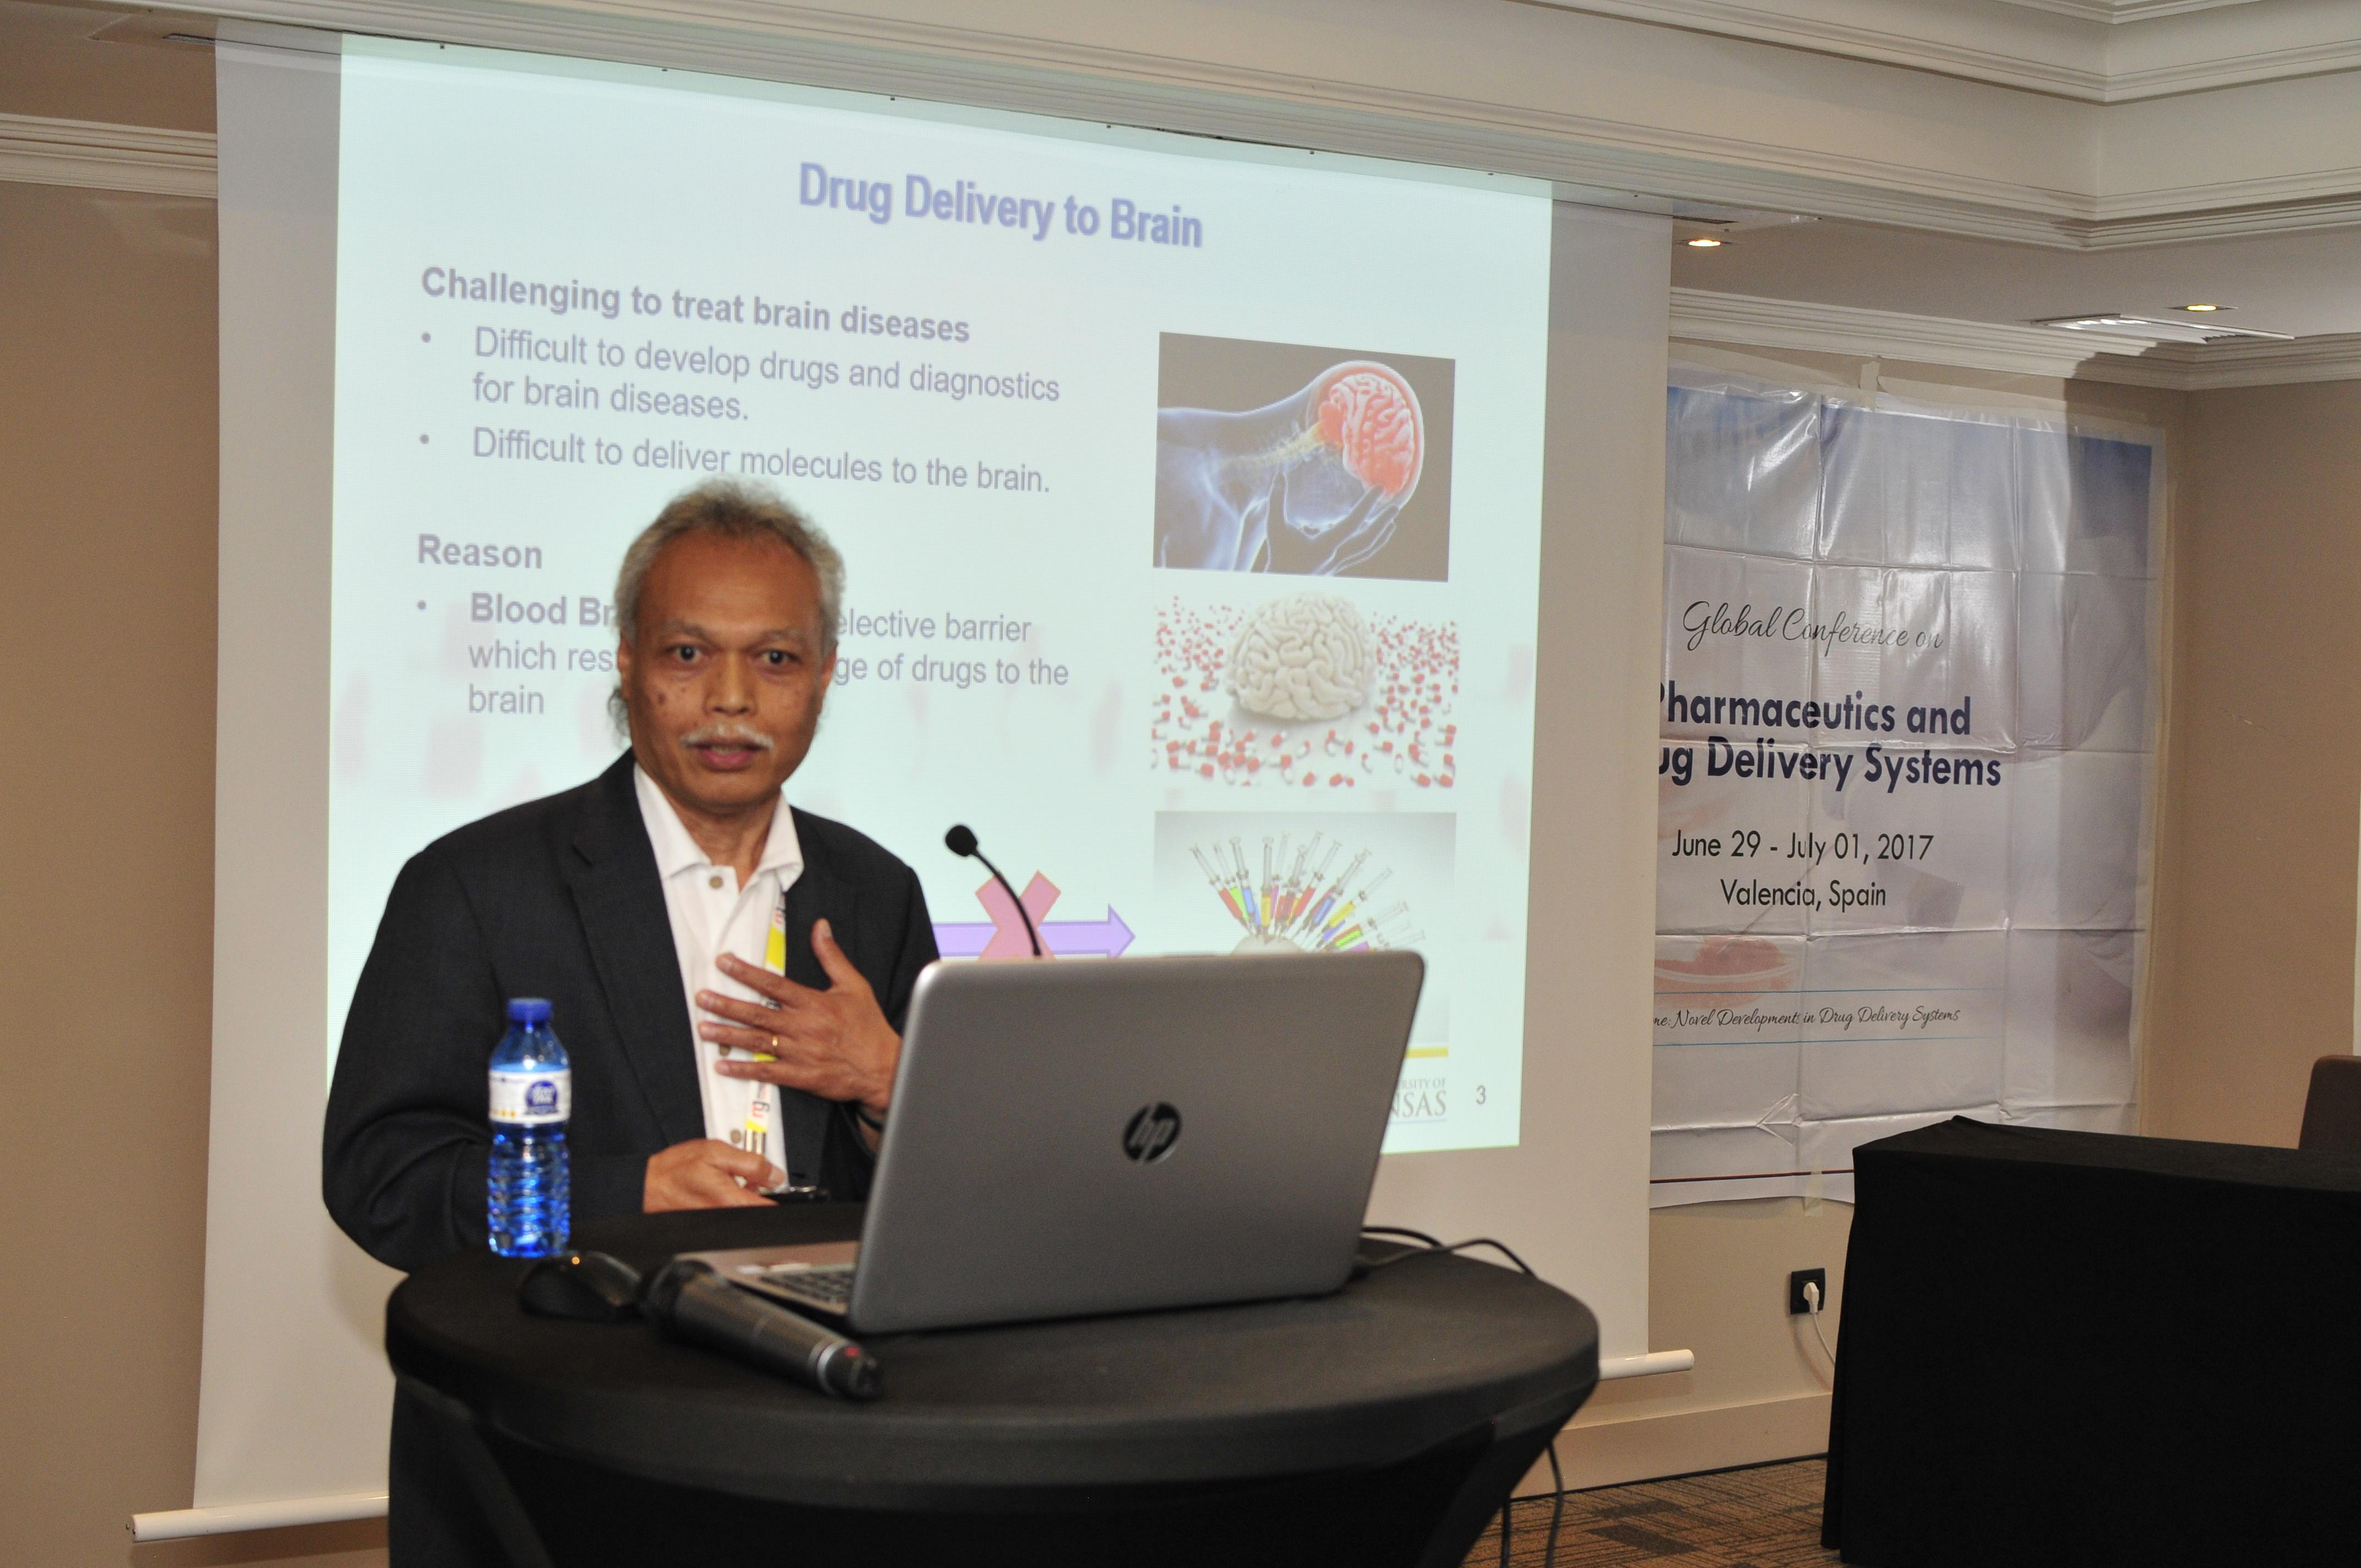 Pharma Conferences